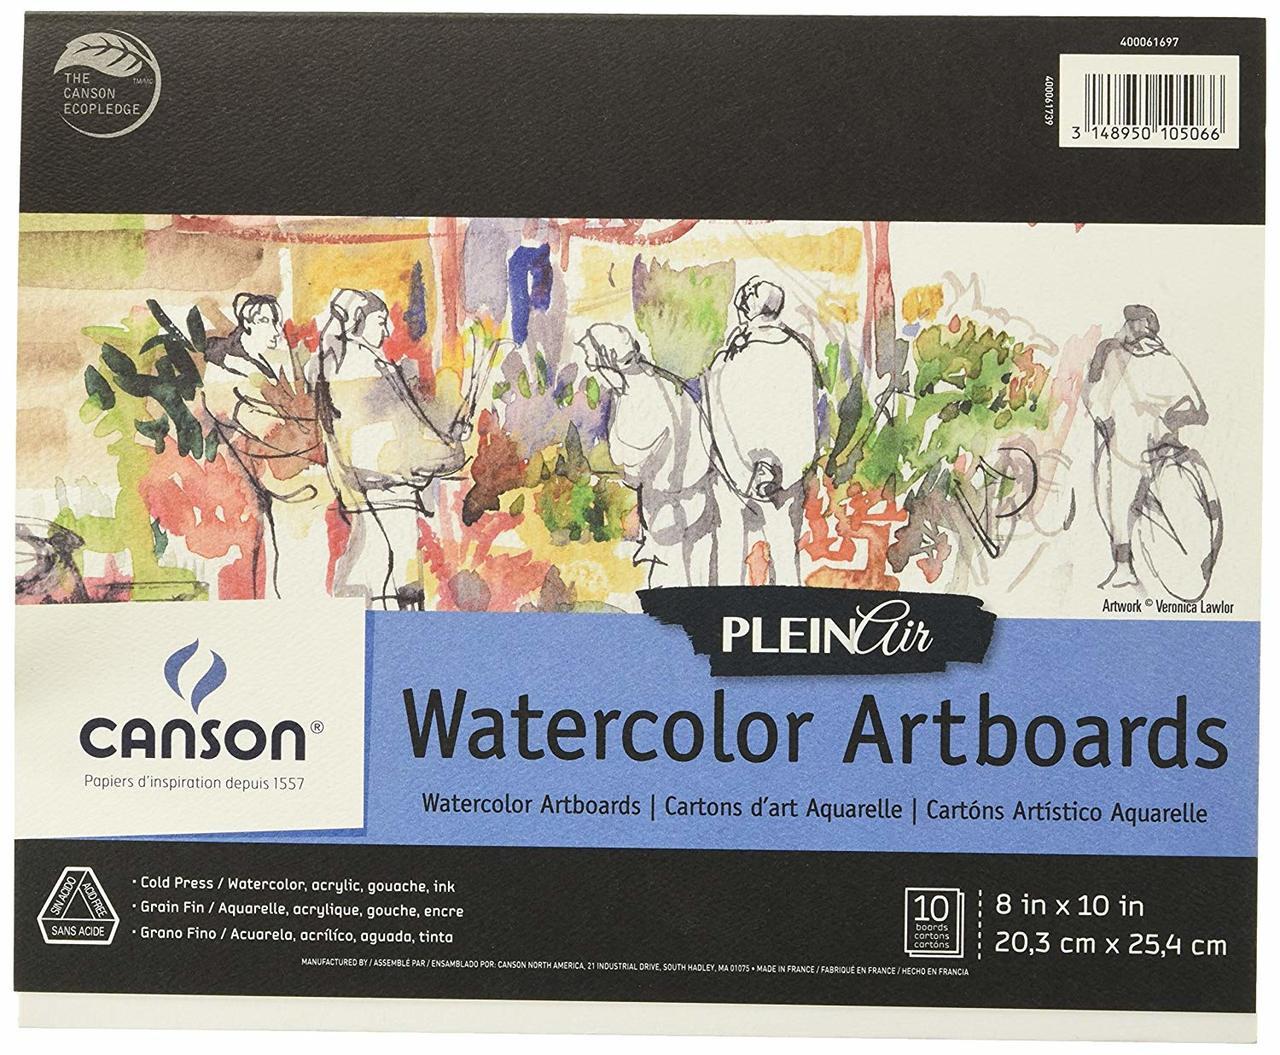 Canson Plein Air Watercolor Artboard 8x10 10sht Pad